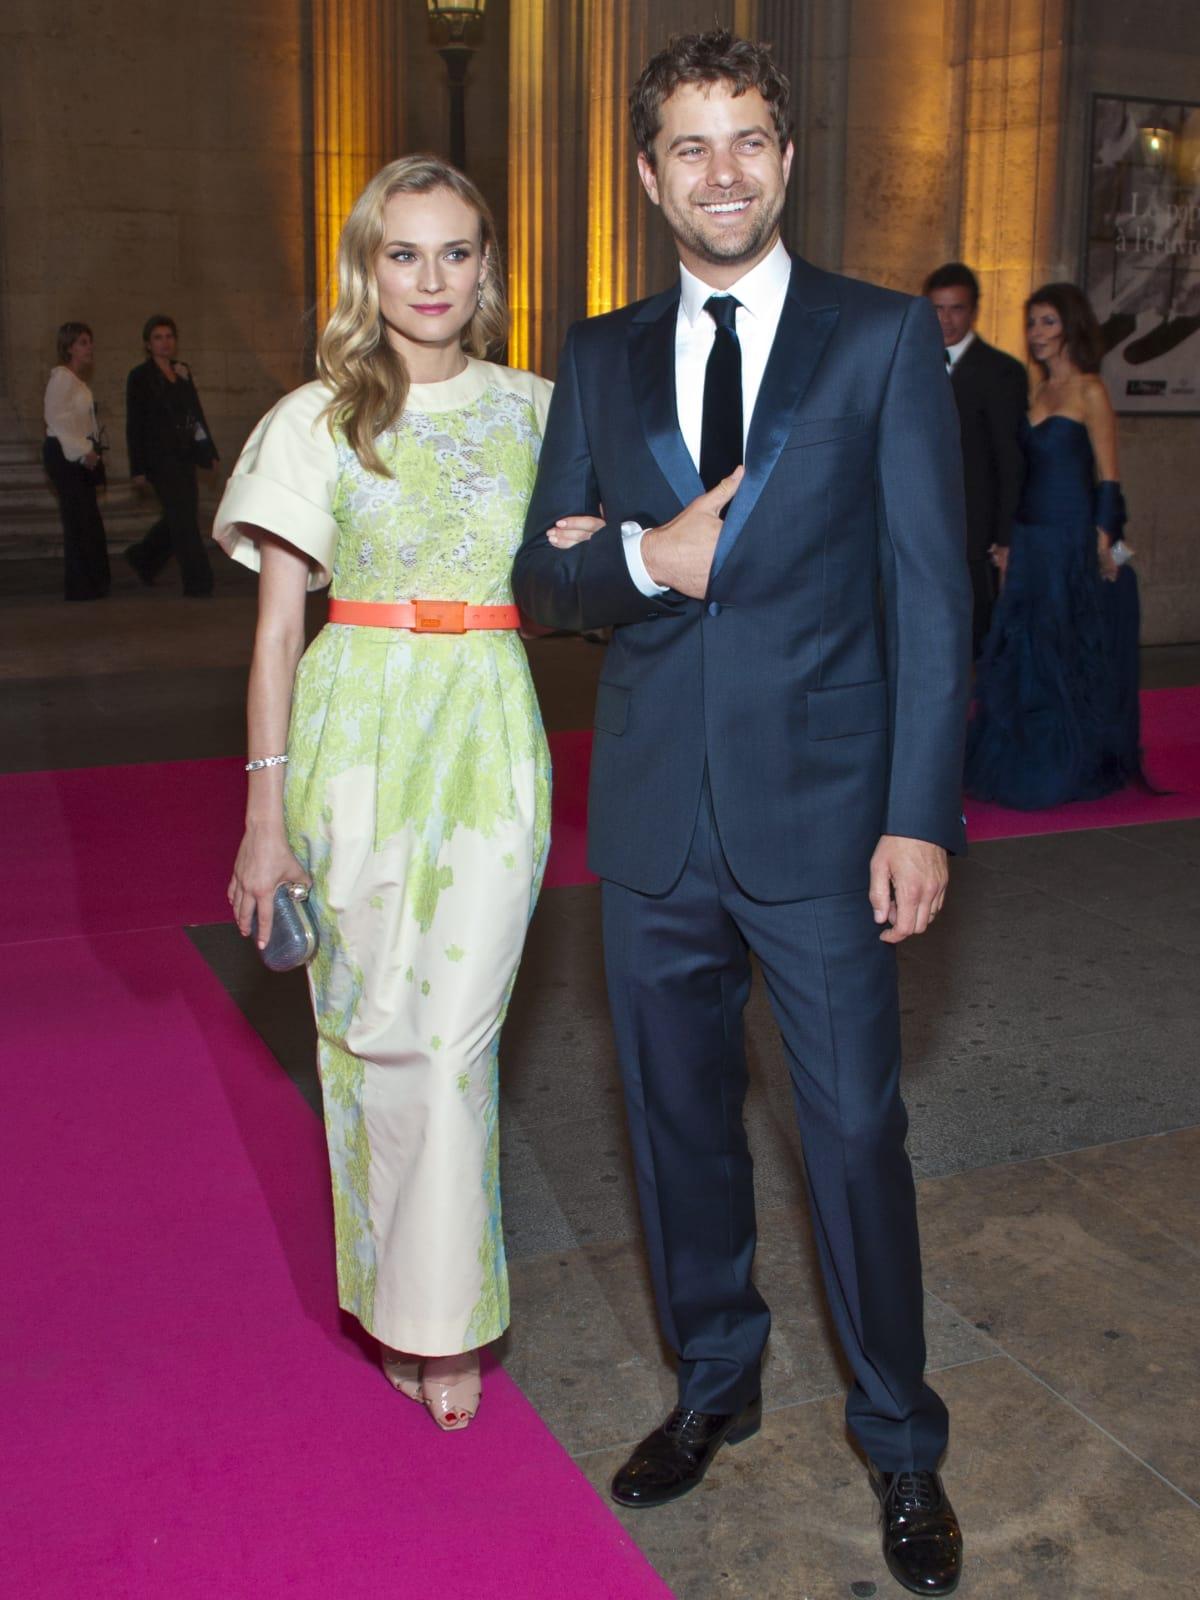 News_Louvre_Diane Kruger_Joshua Jackson__June 2011